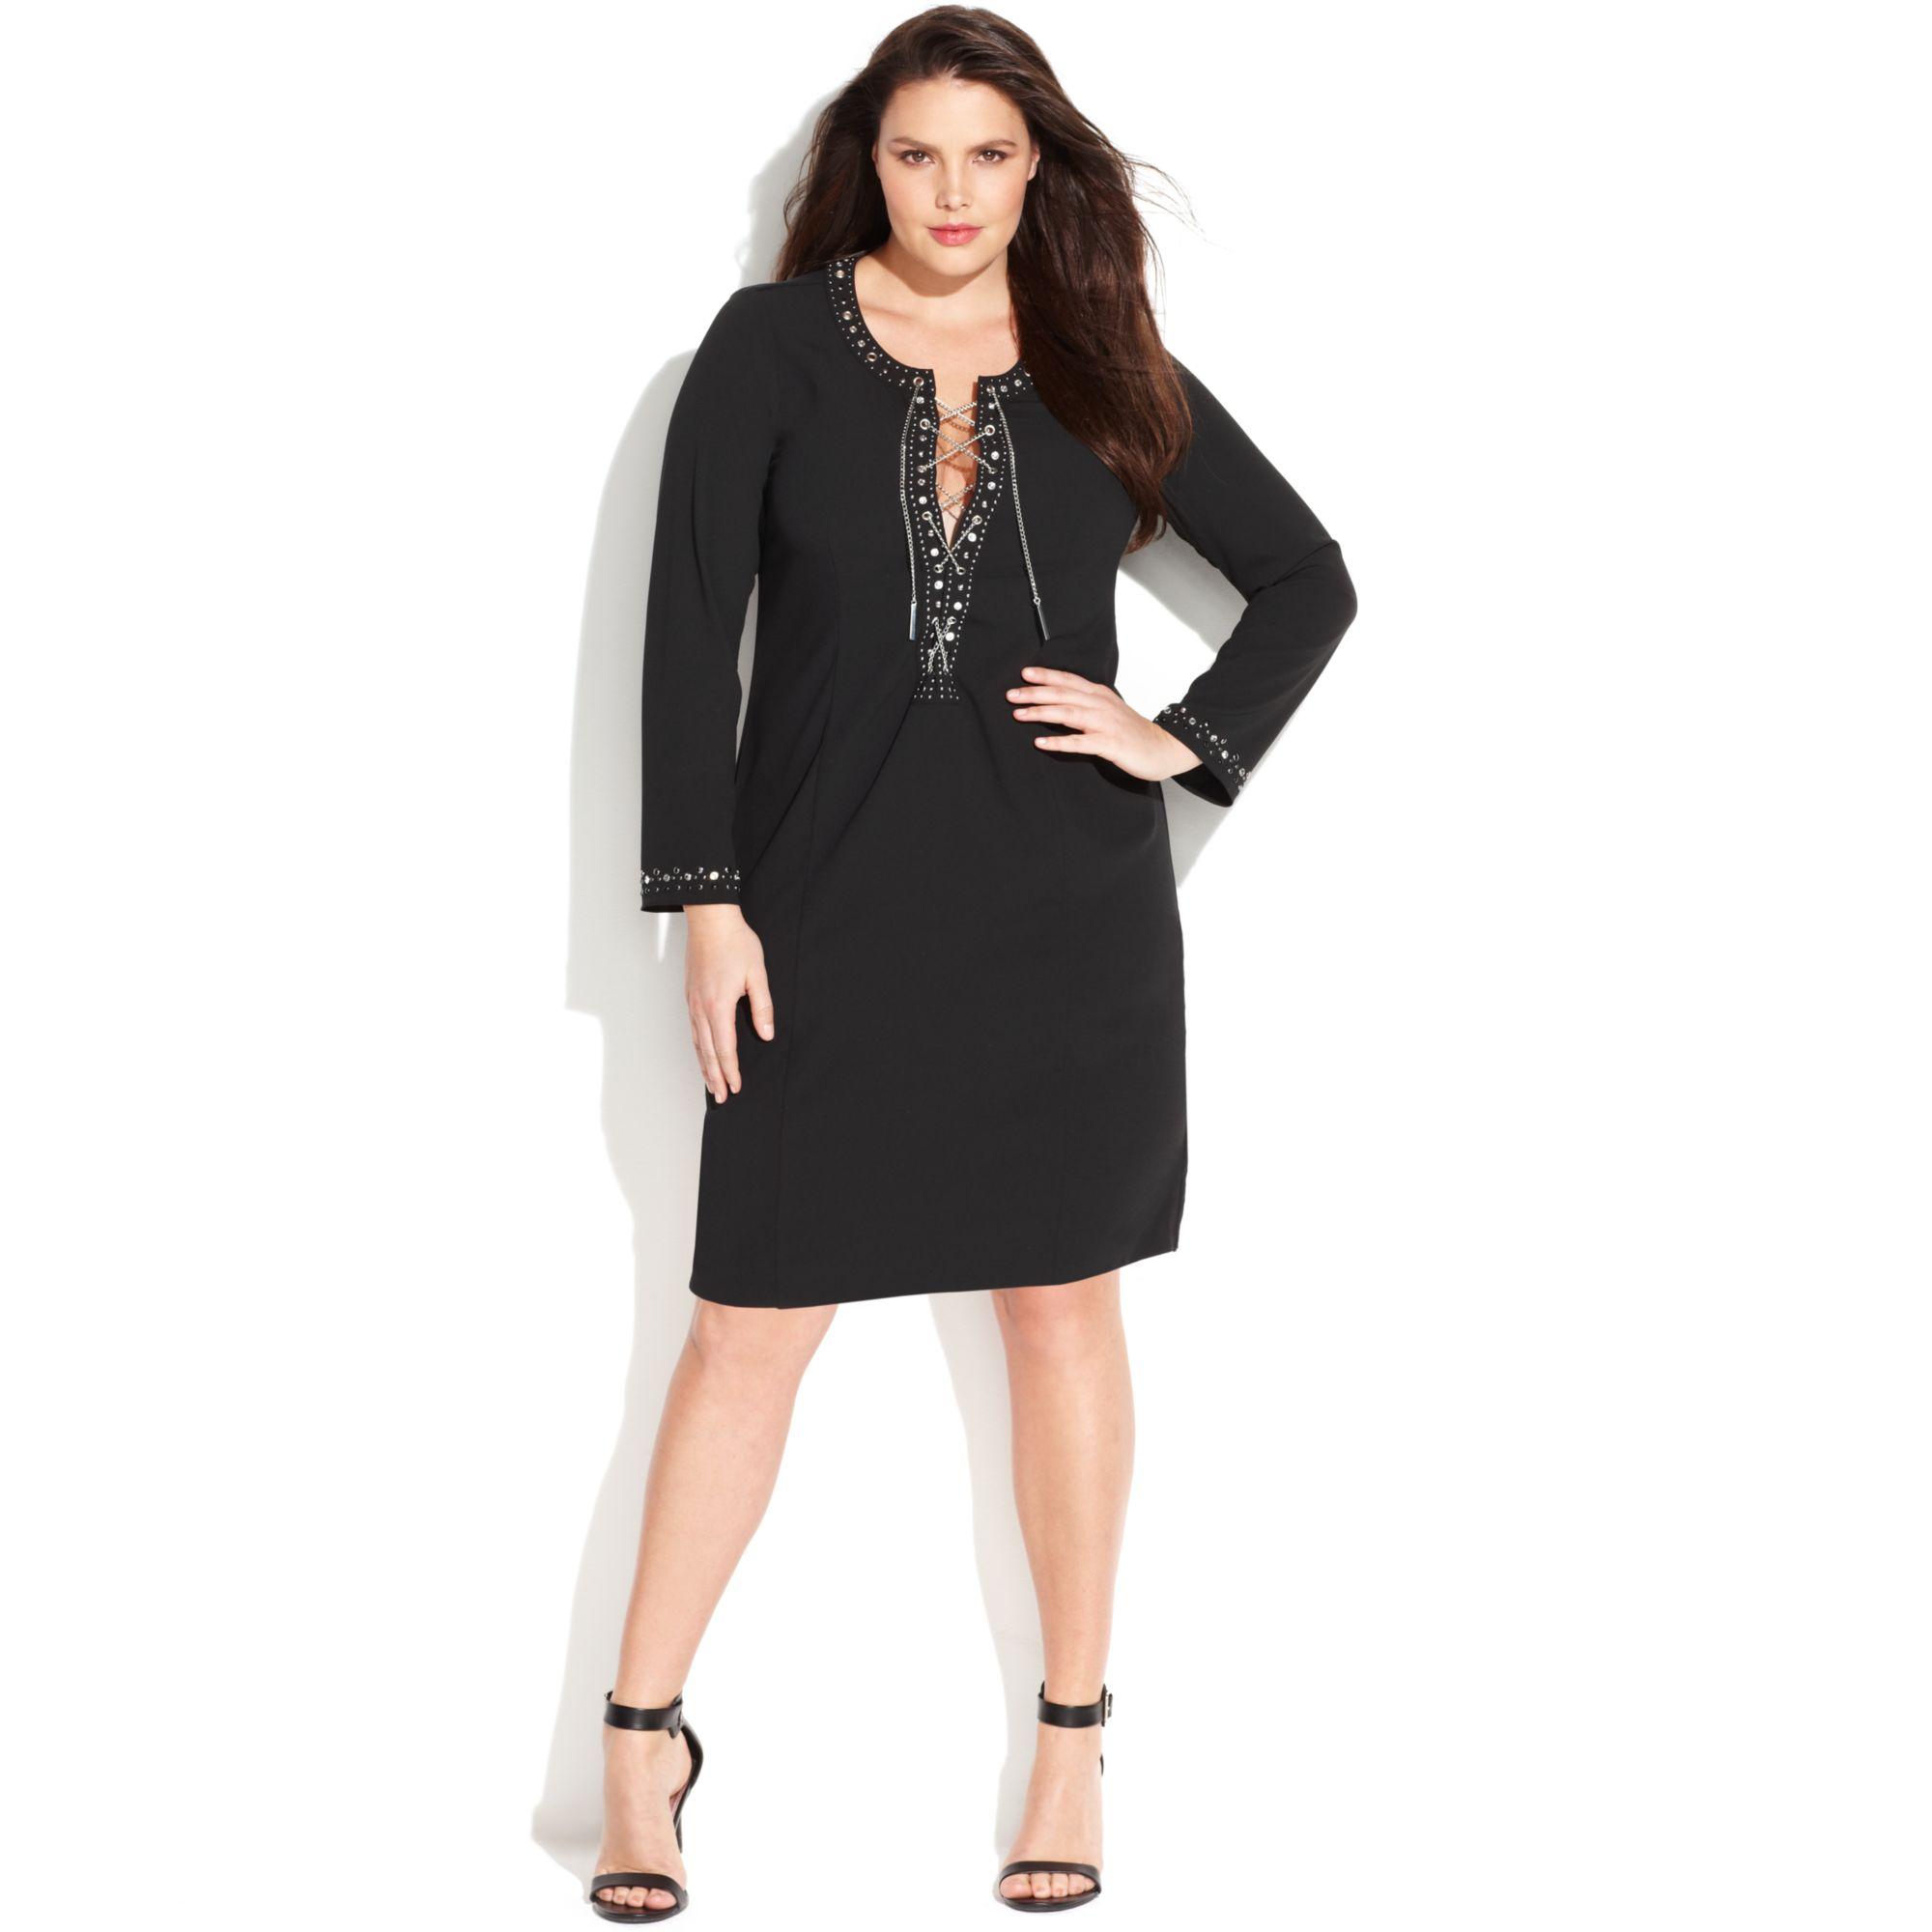 Michael Plus Size Laceup Embellished Sheath Dress